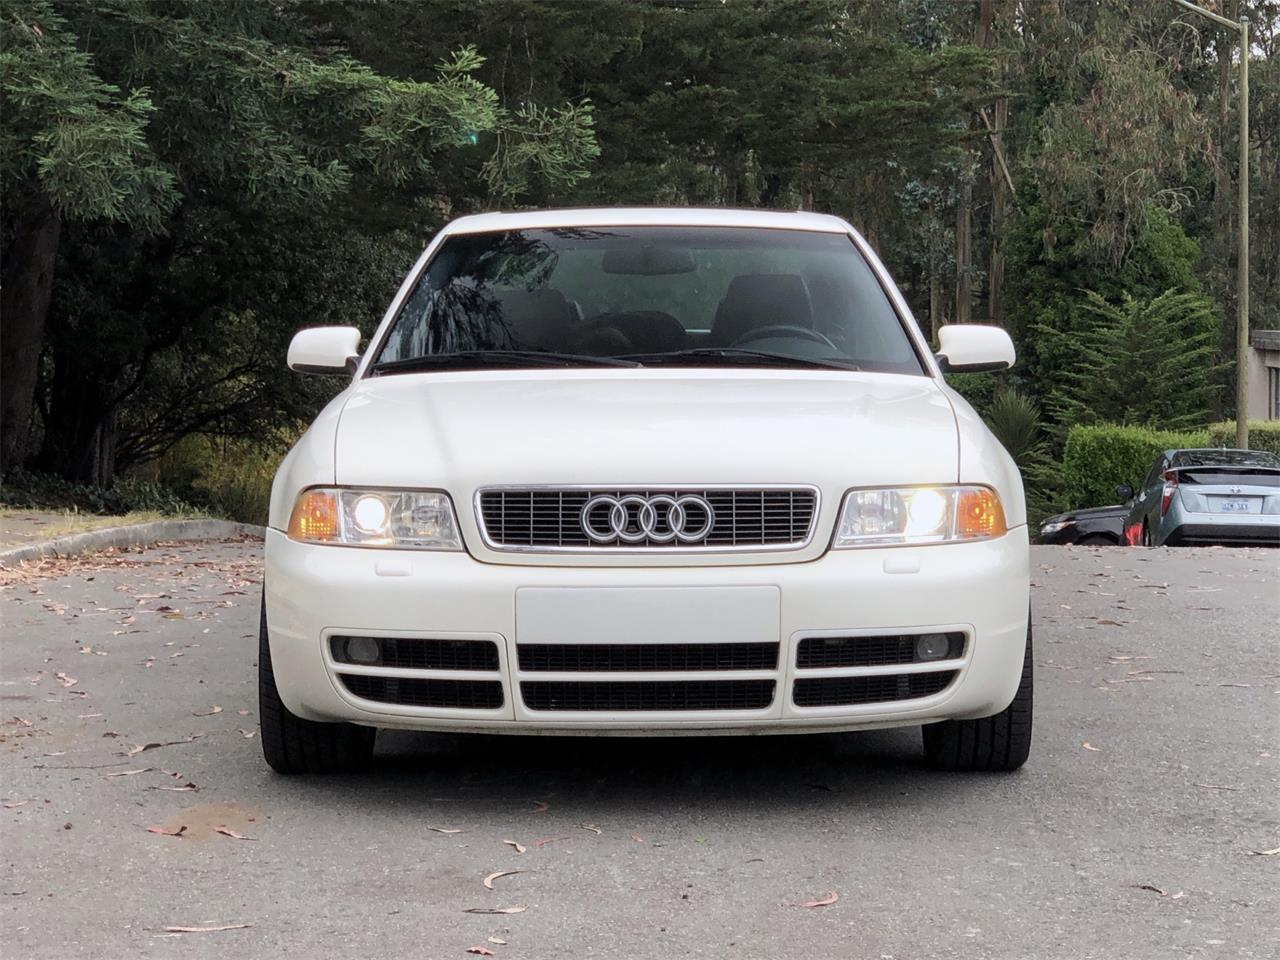 Large Picture of 2001 Audi S4 located in California - QDIC